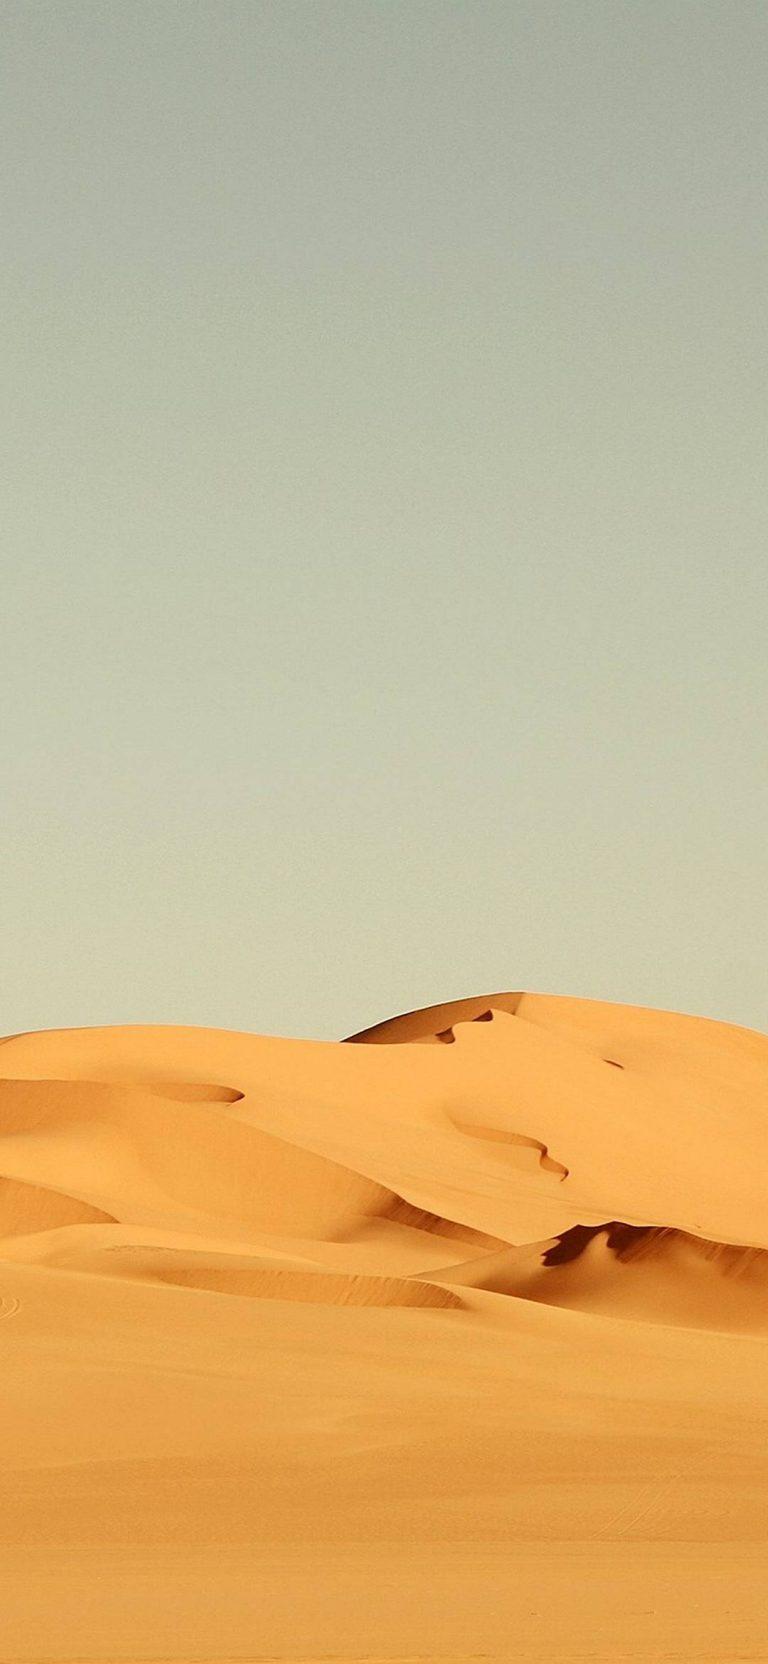 Sahara Desert 1080x2340 768x1664